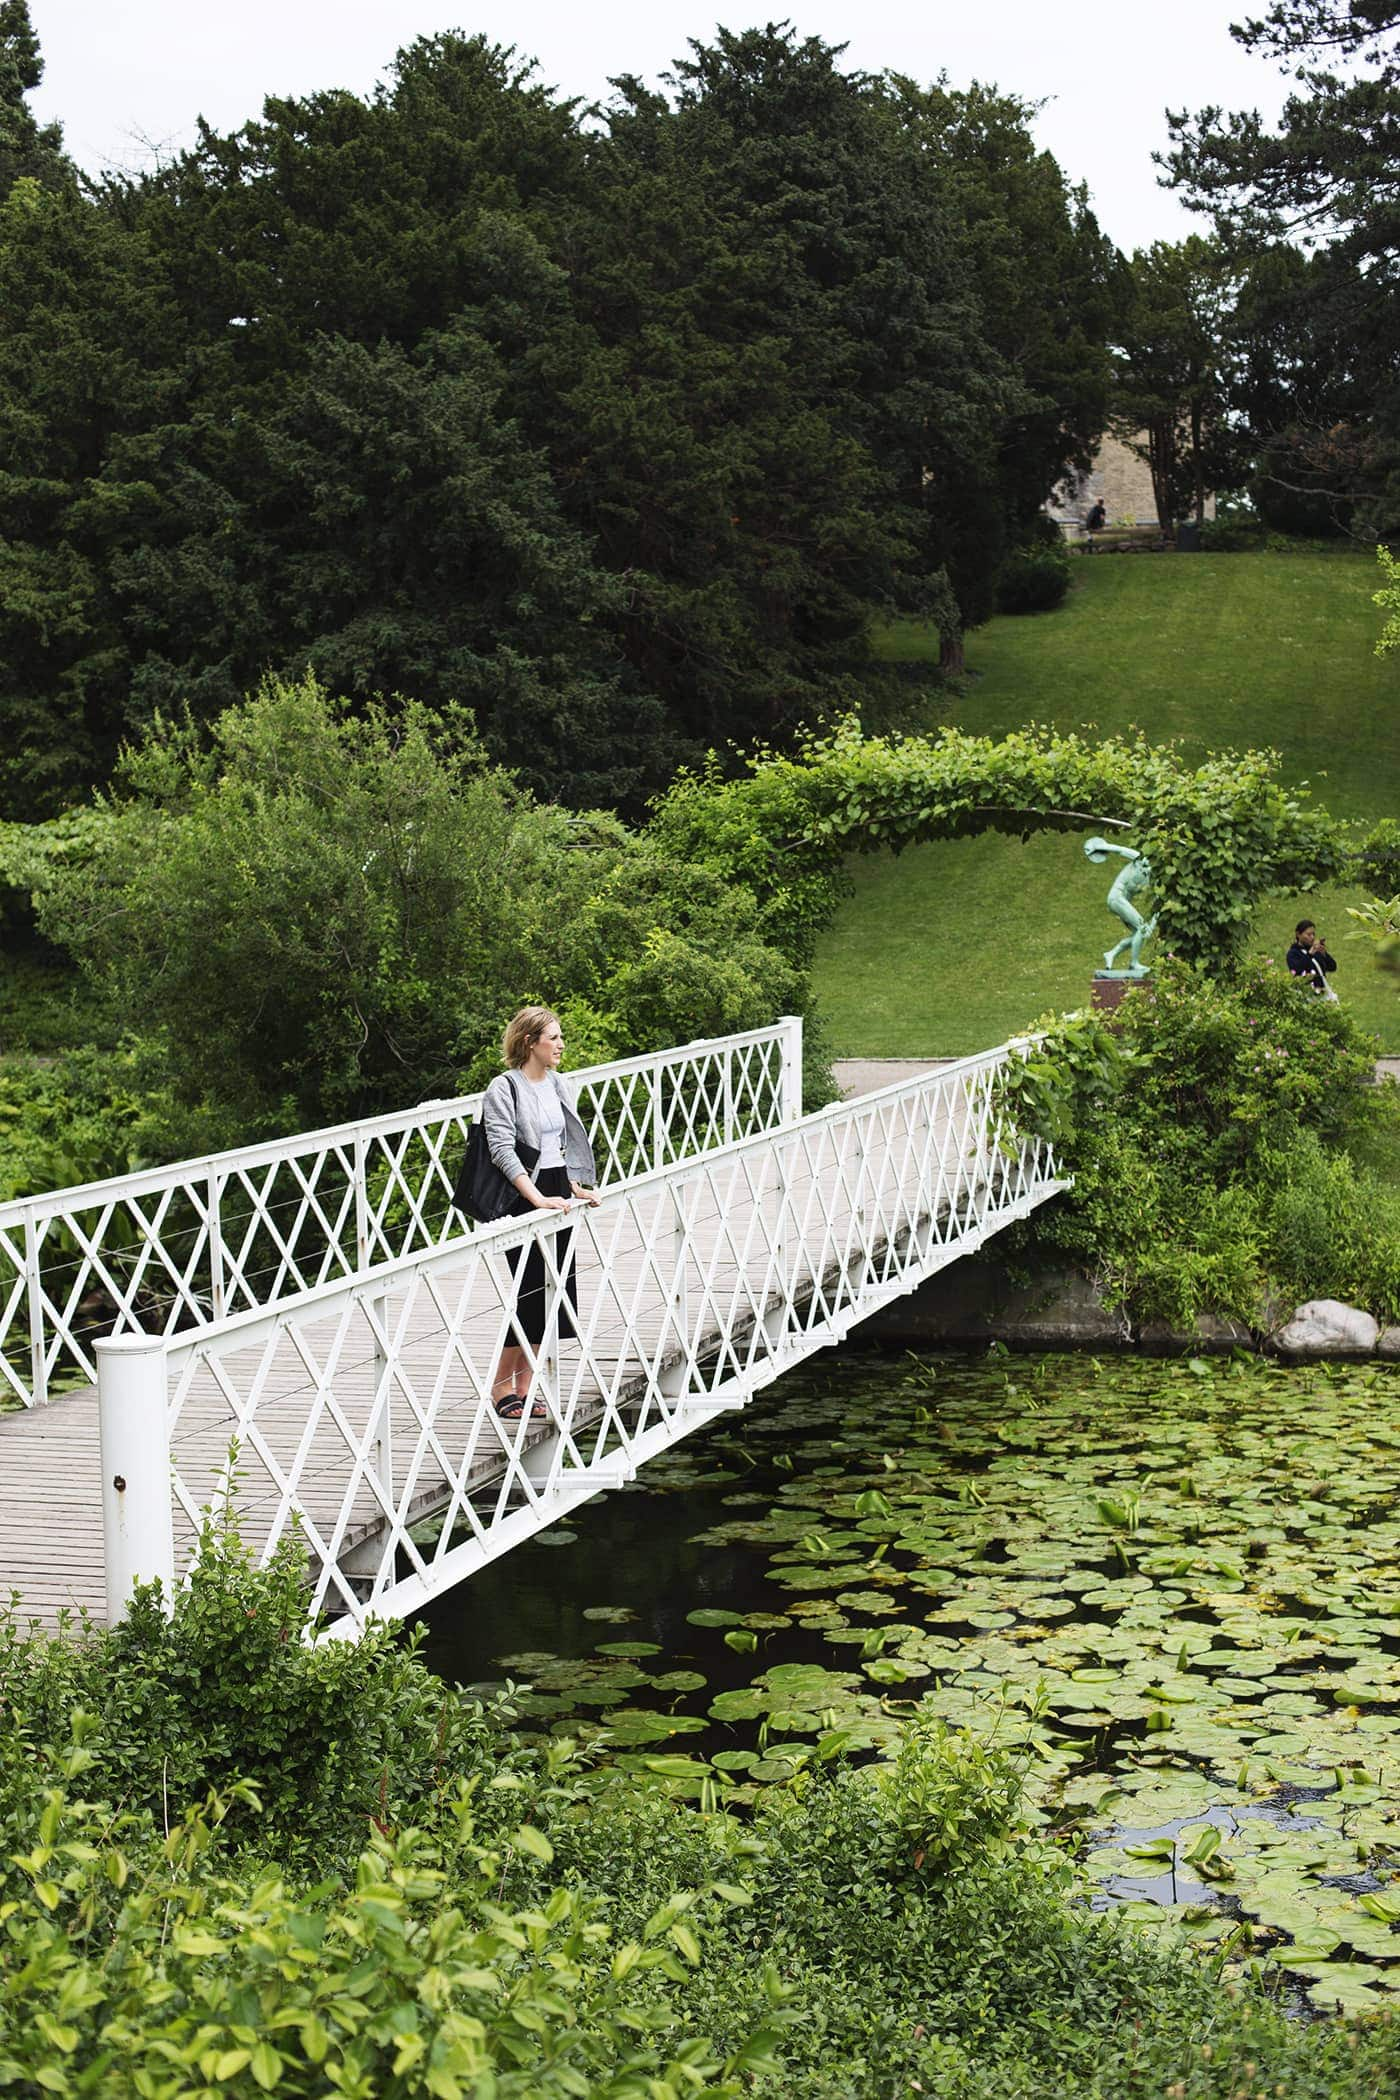 copenhagen-wanderlust-botanical-gardens-8